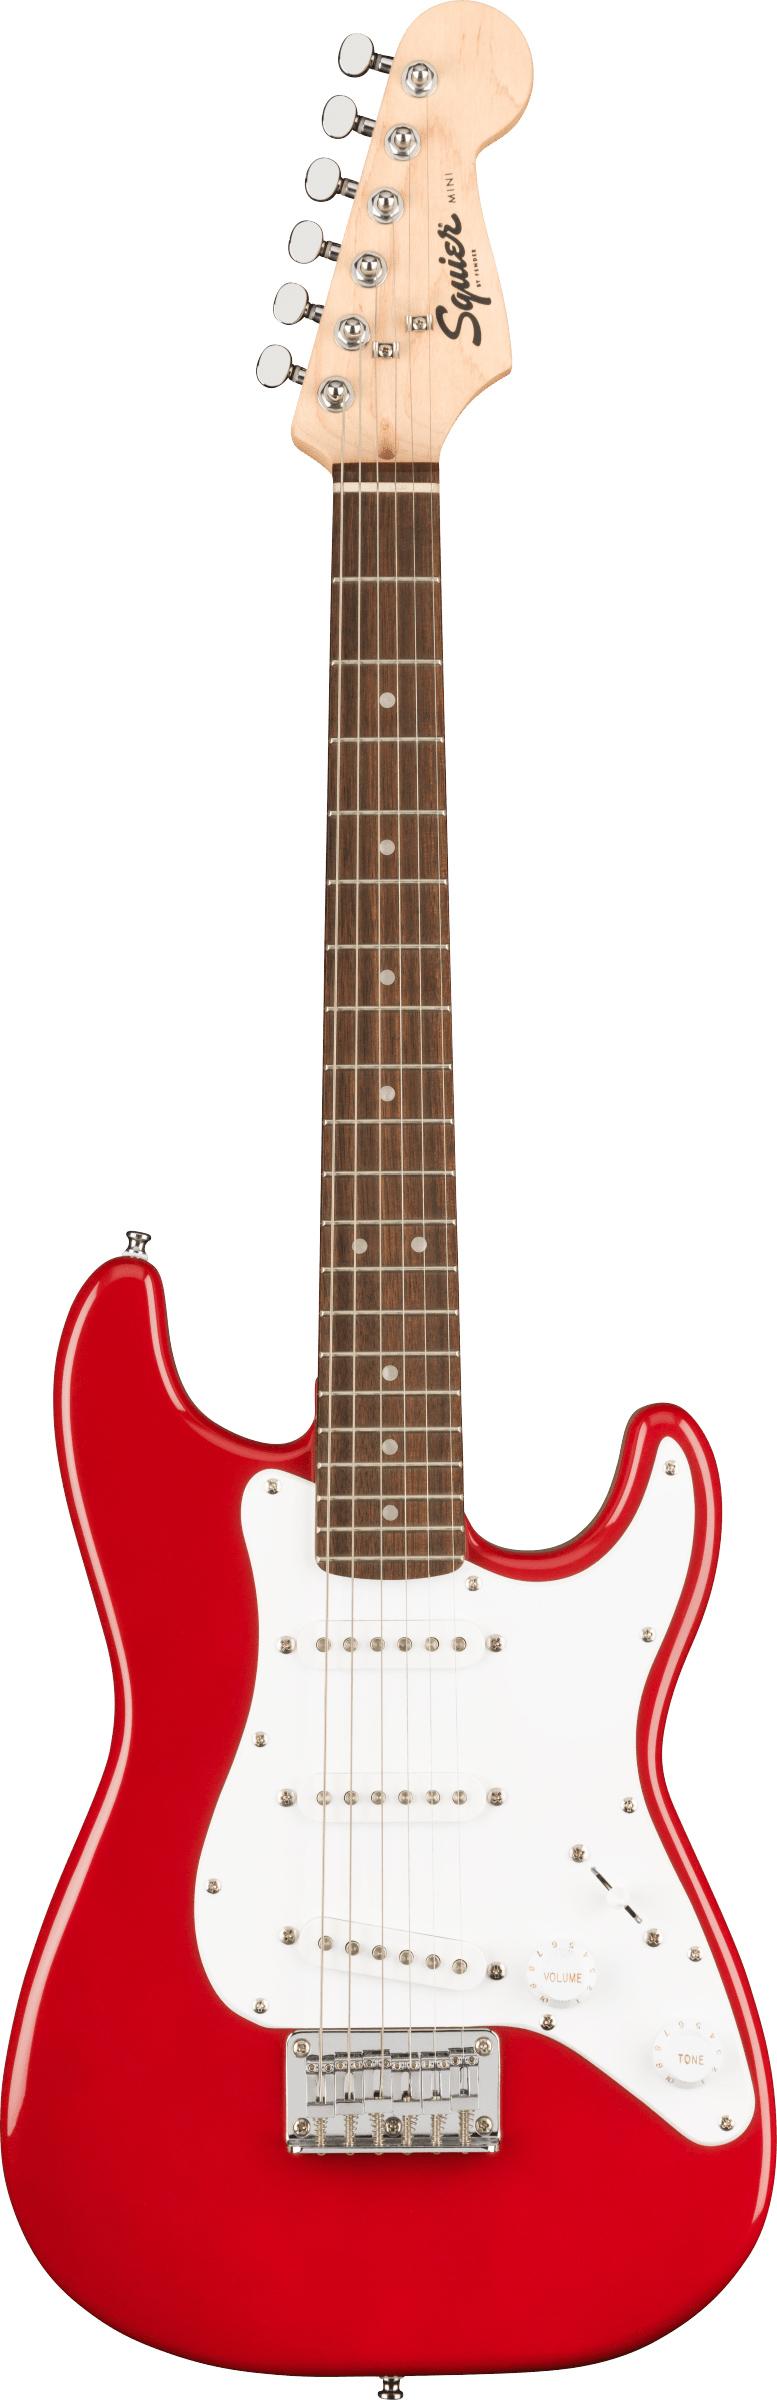 thumbnail 2 - Fender Squier 3/4-Size Mini Stratocaster - Dakota Red w/ Cable